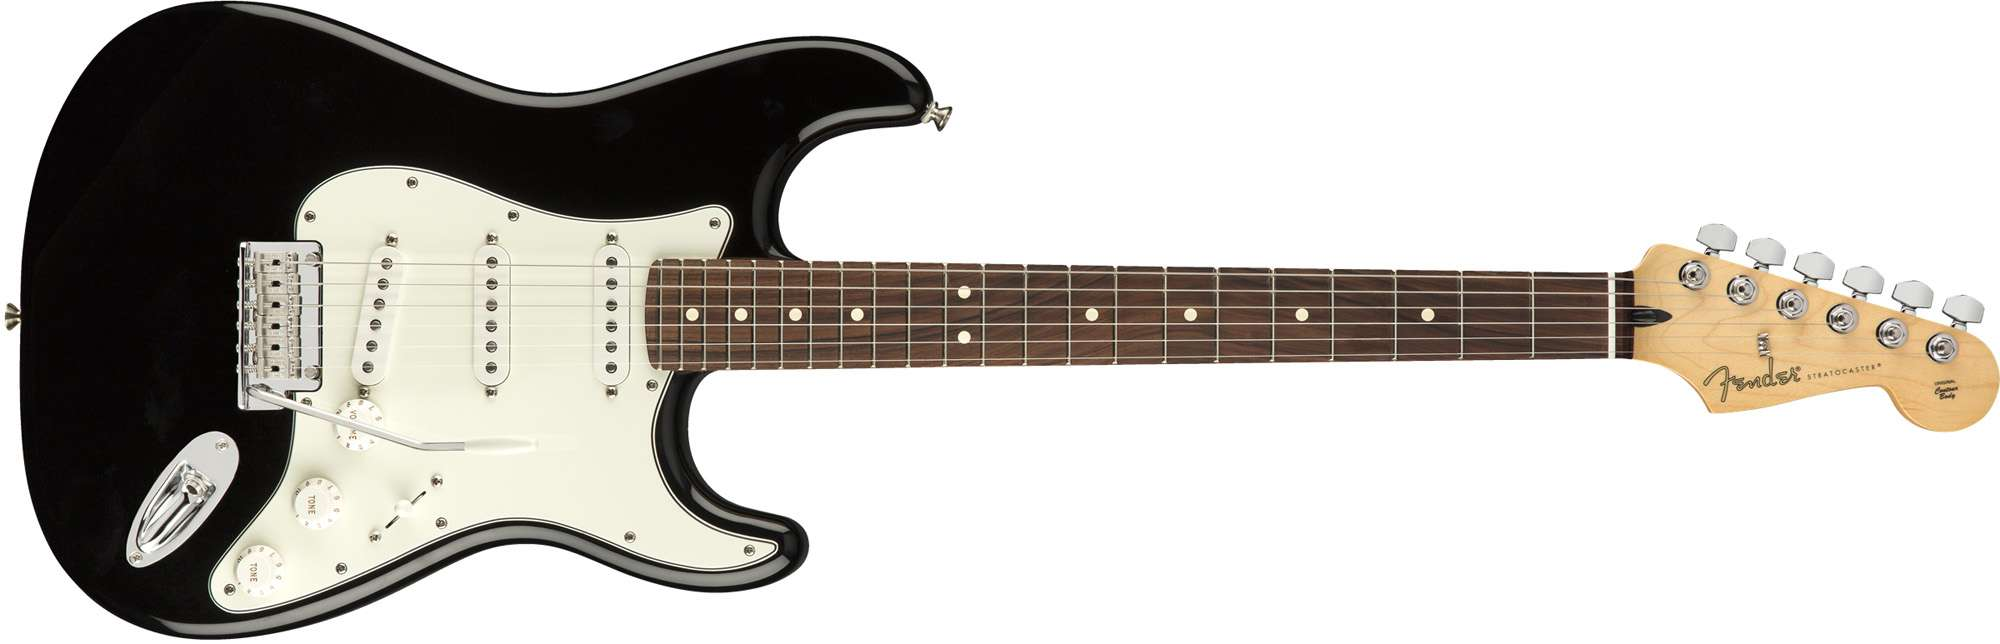 FENDER-Player-Stratocaster-PF-Black-0144503506-sku-22431